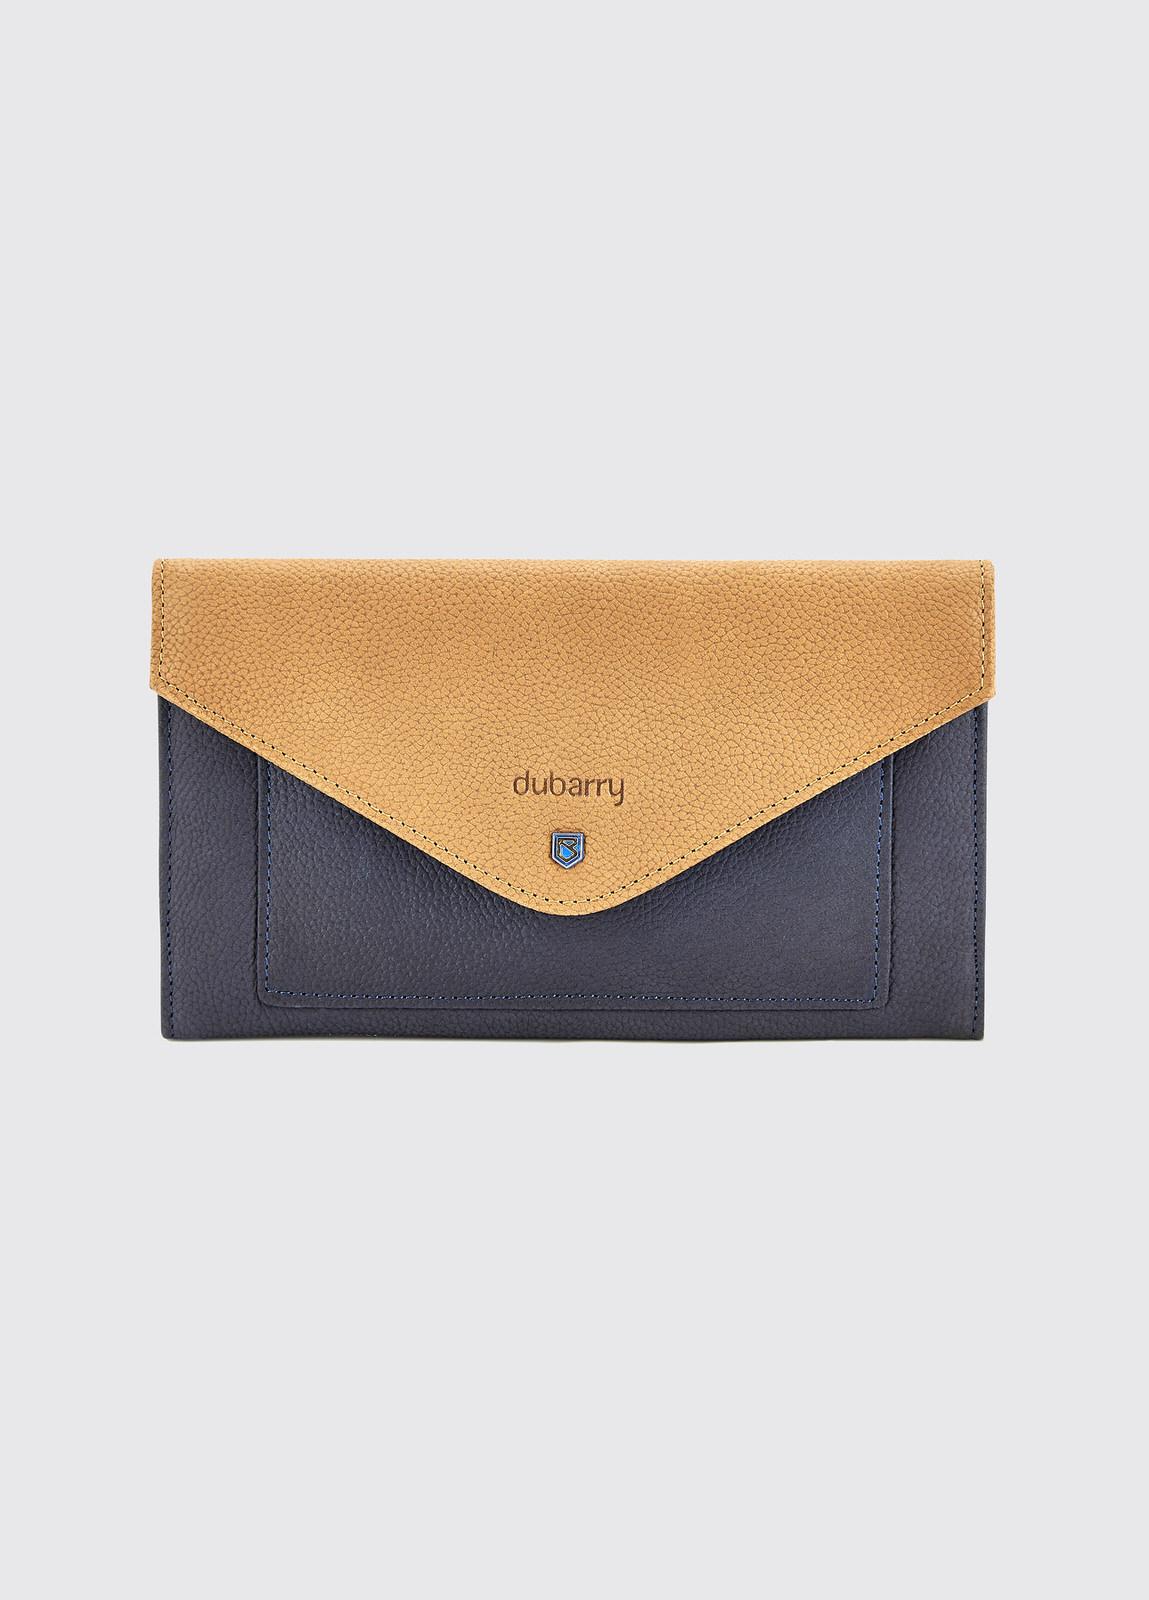 Athlone Wallet - Navy/Tan